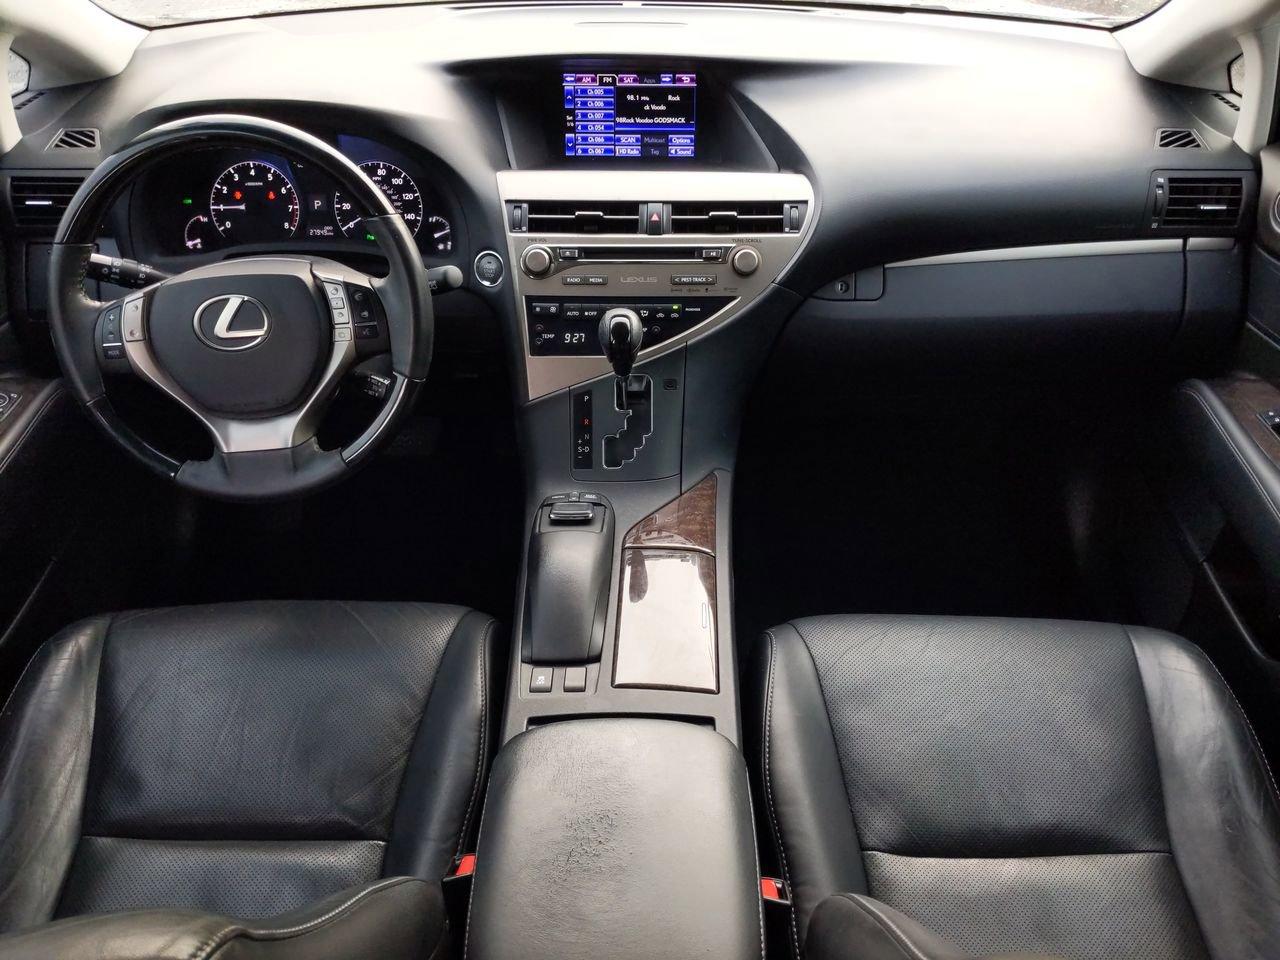 Pre-Owned 2015 Lexus RX 350 FWD 4dr